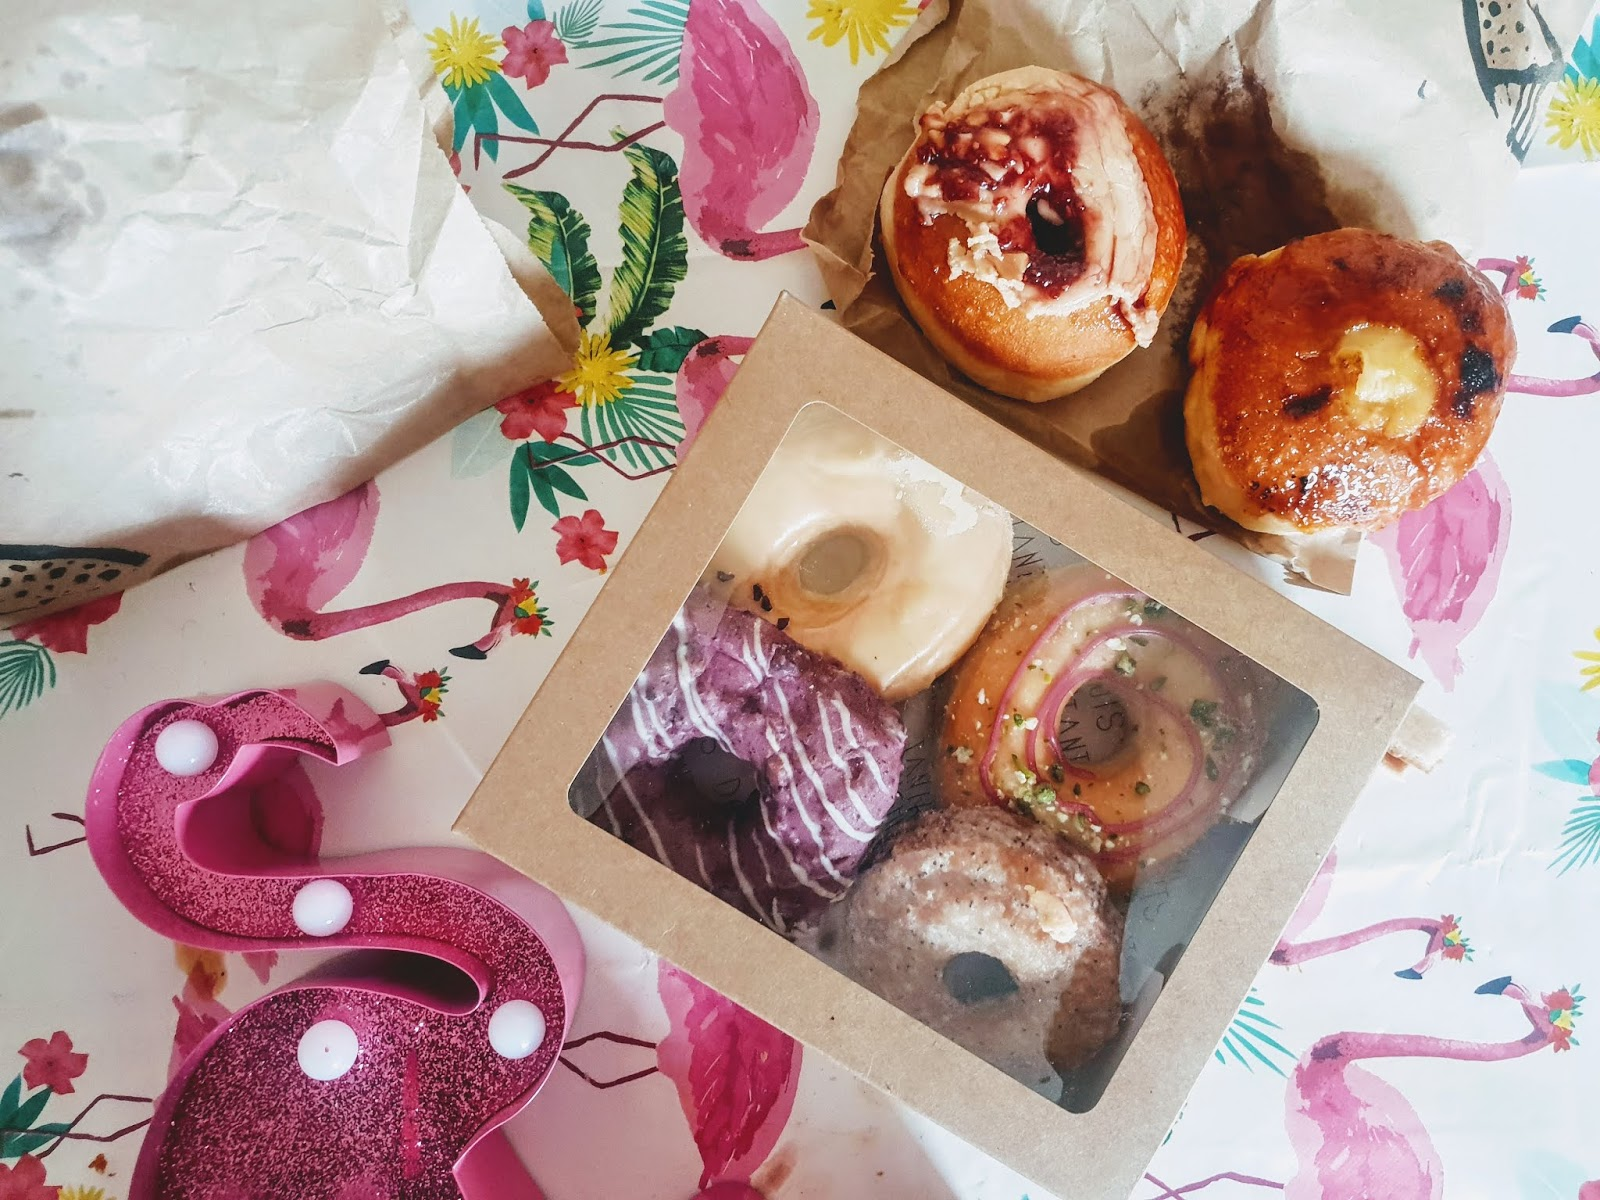 tantrum doughnuts glasgow review